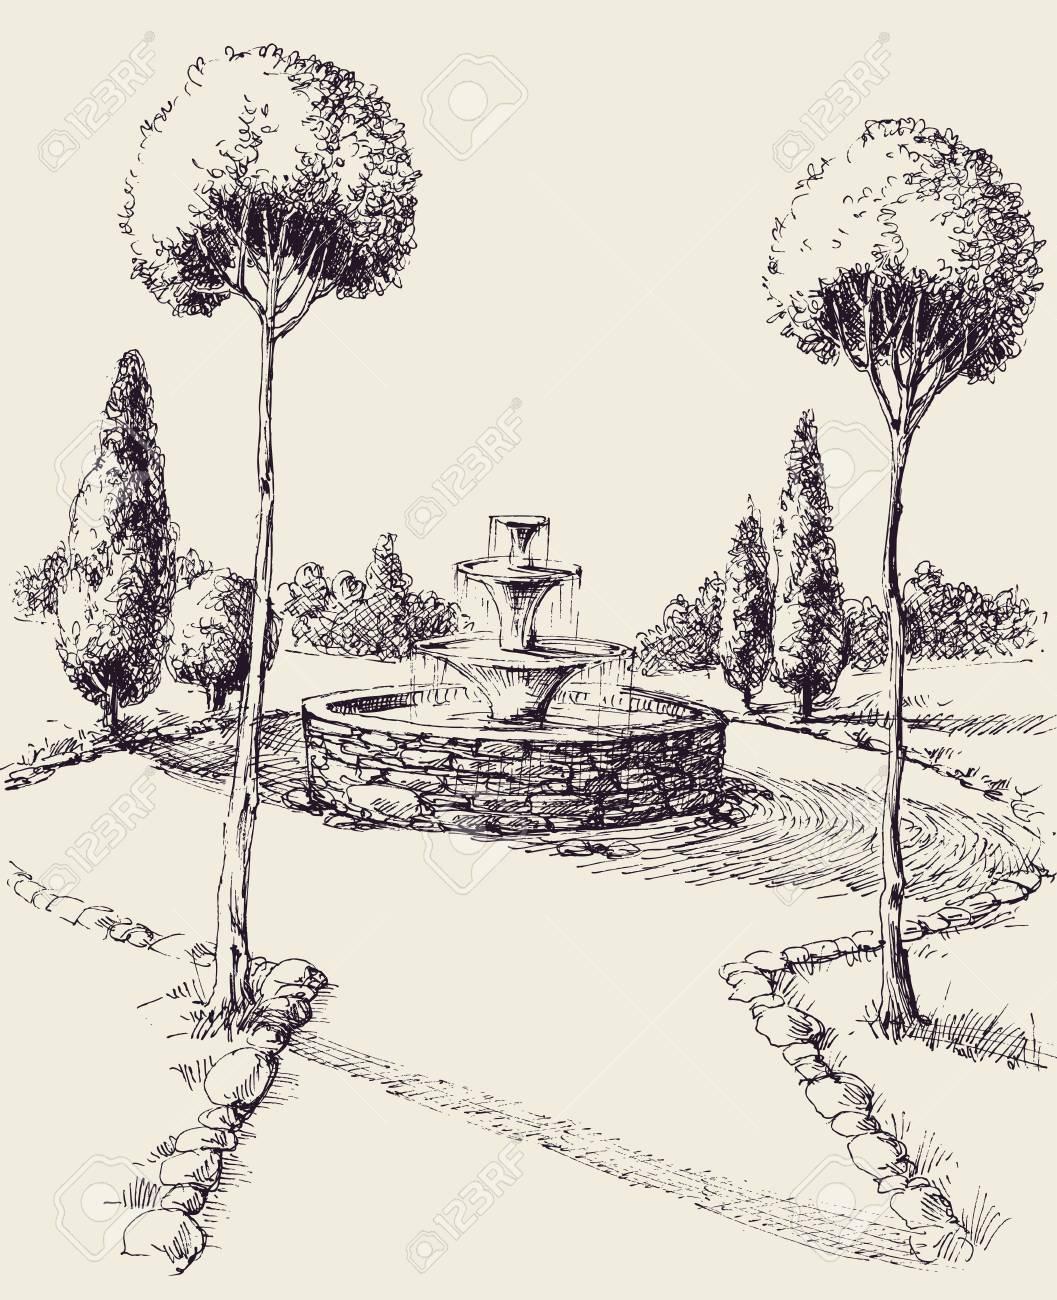 Water Fountain Drawing : water, fountain, drawing, Water, Fountain, Drawing., Alley, Sketch, Royalty, Cliparts,, Vectors,, Stock, Illustration., Image, 122945241.